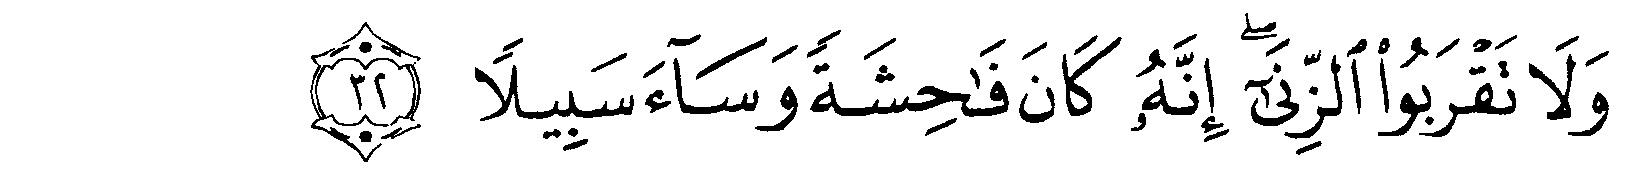 Tafsir Ibnu Katsir Surah An Israa Ayat 32 Alquranmulia